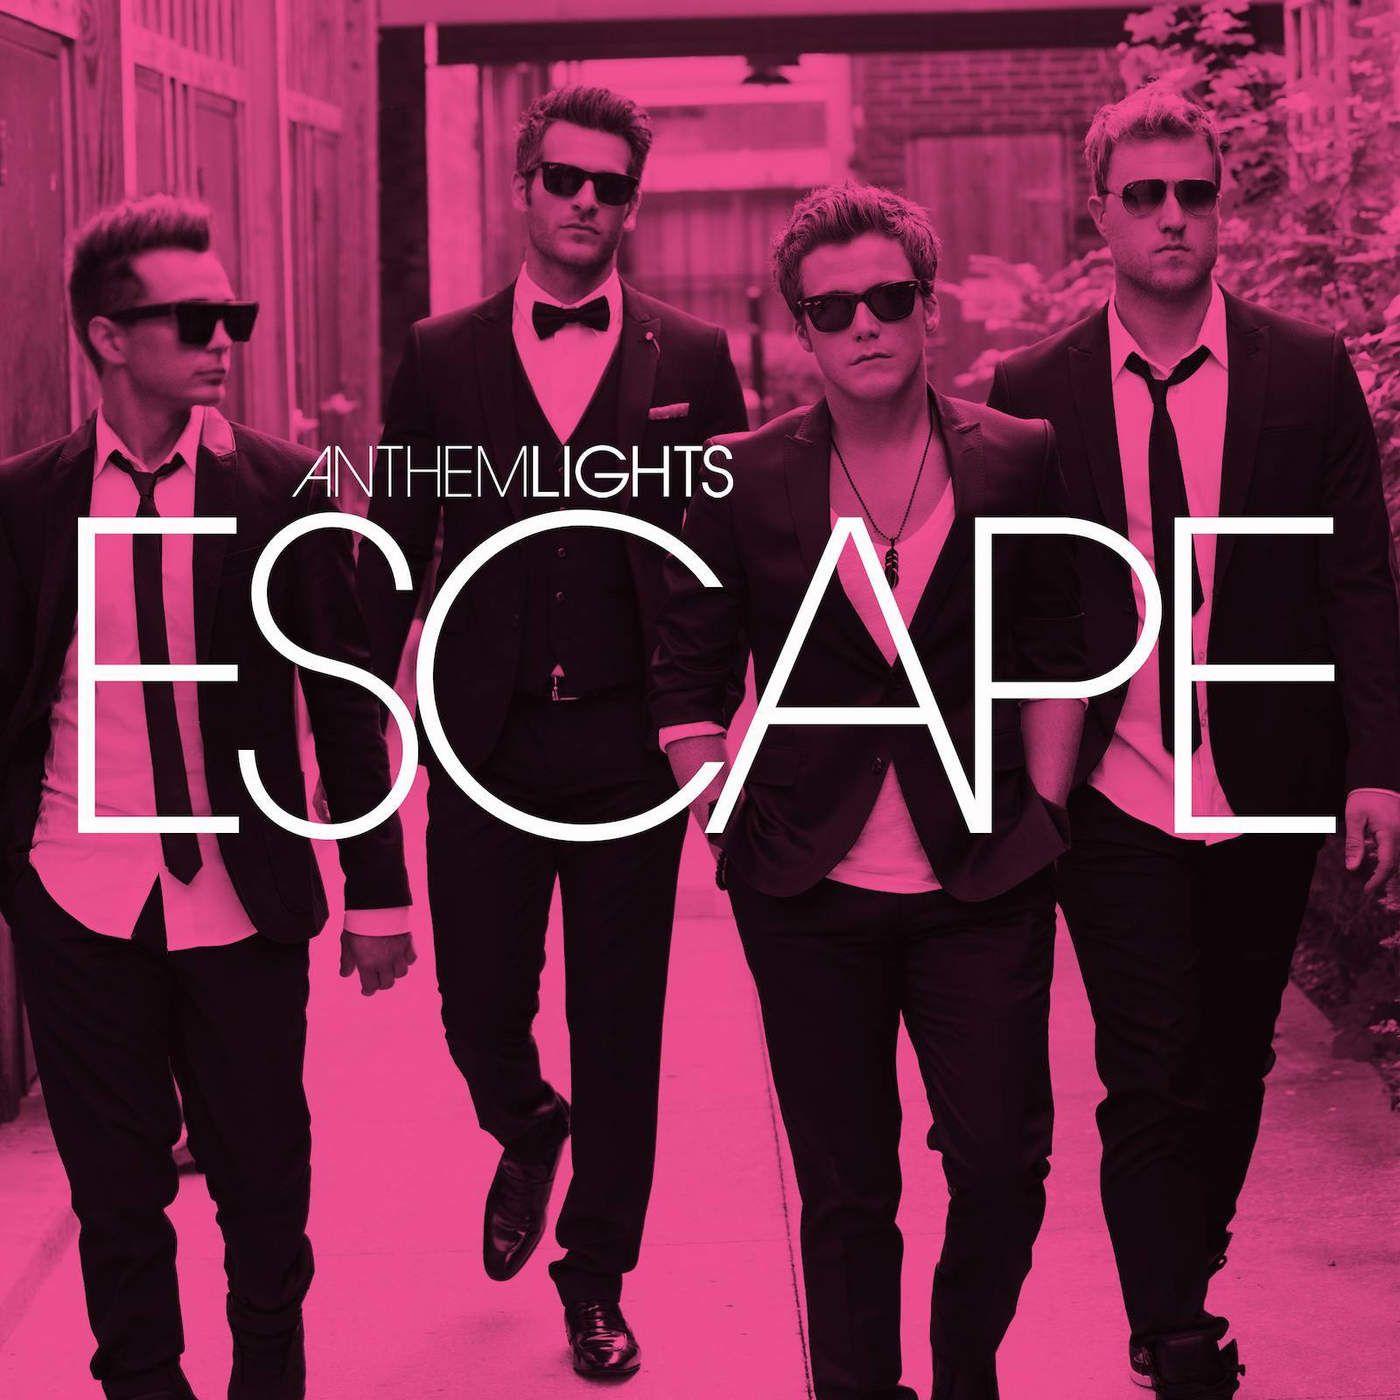 Anthem_Lights_-_Escape_Album_Download